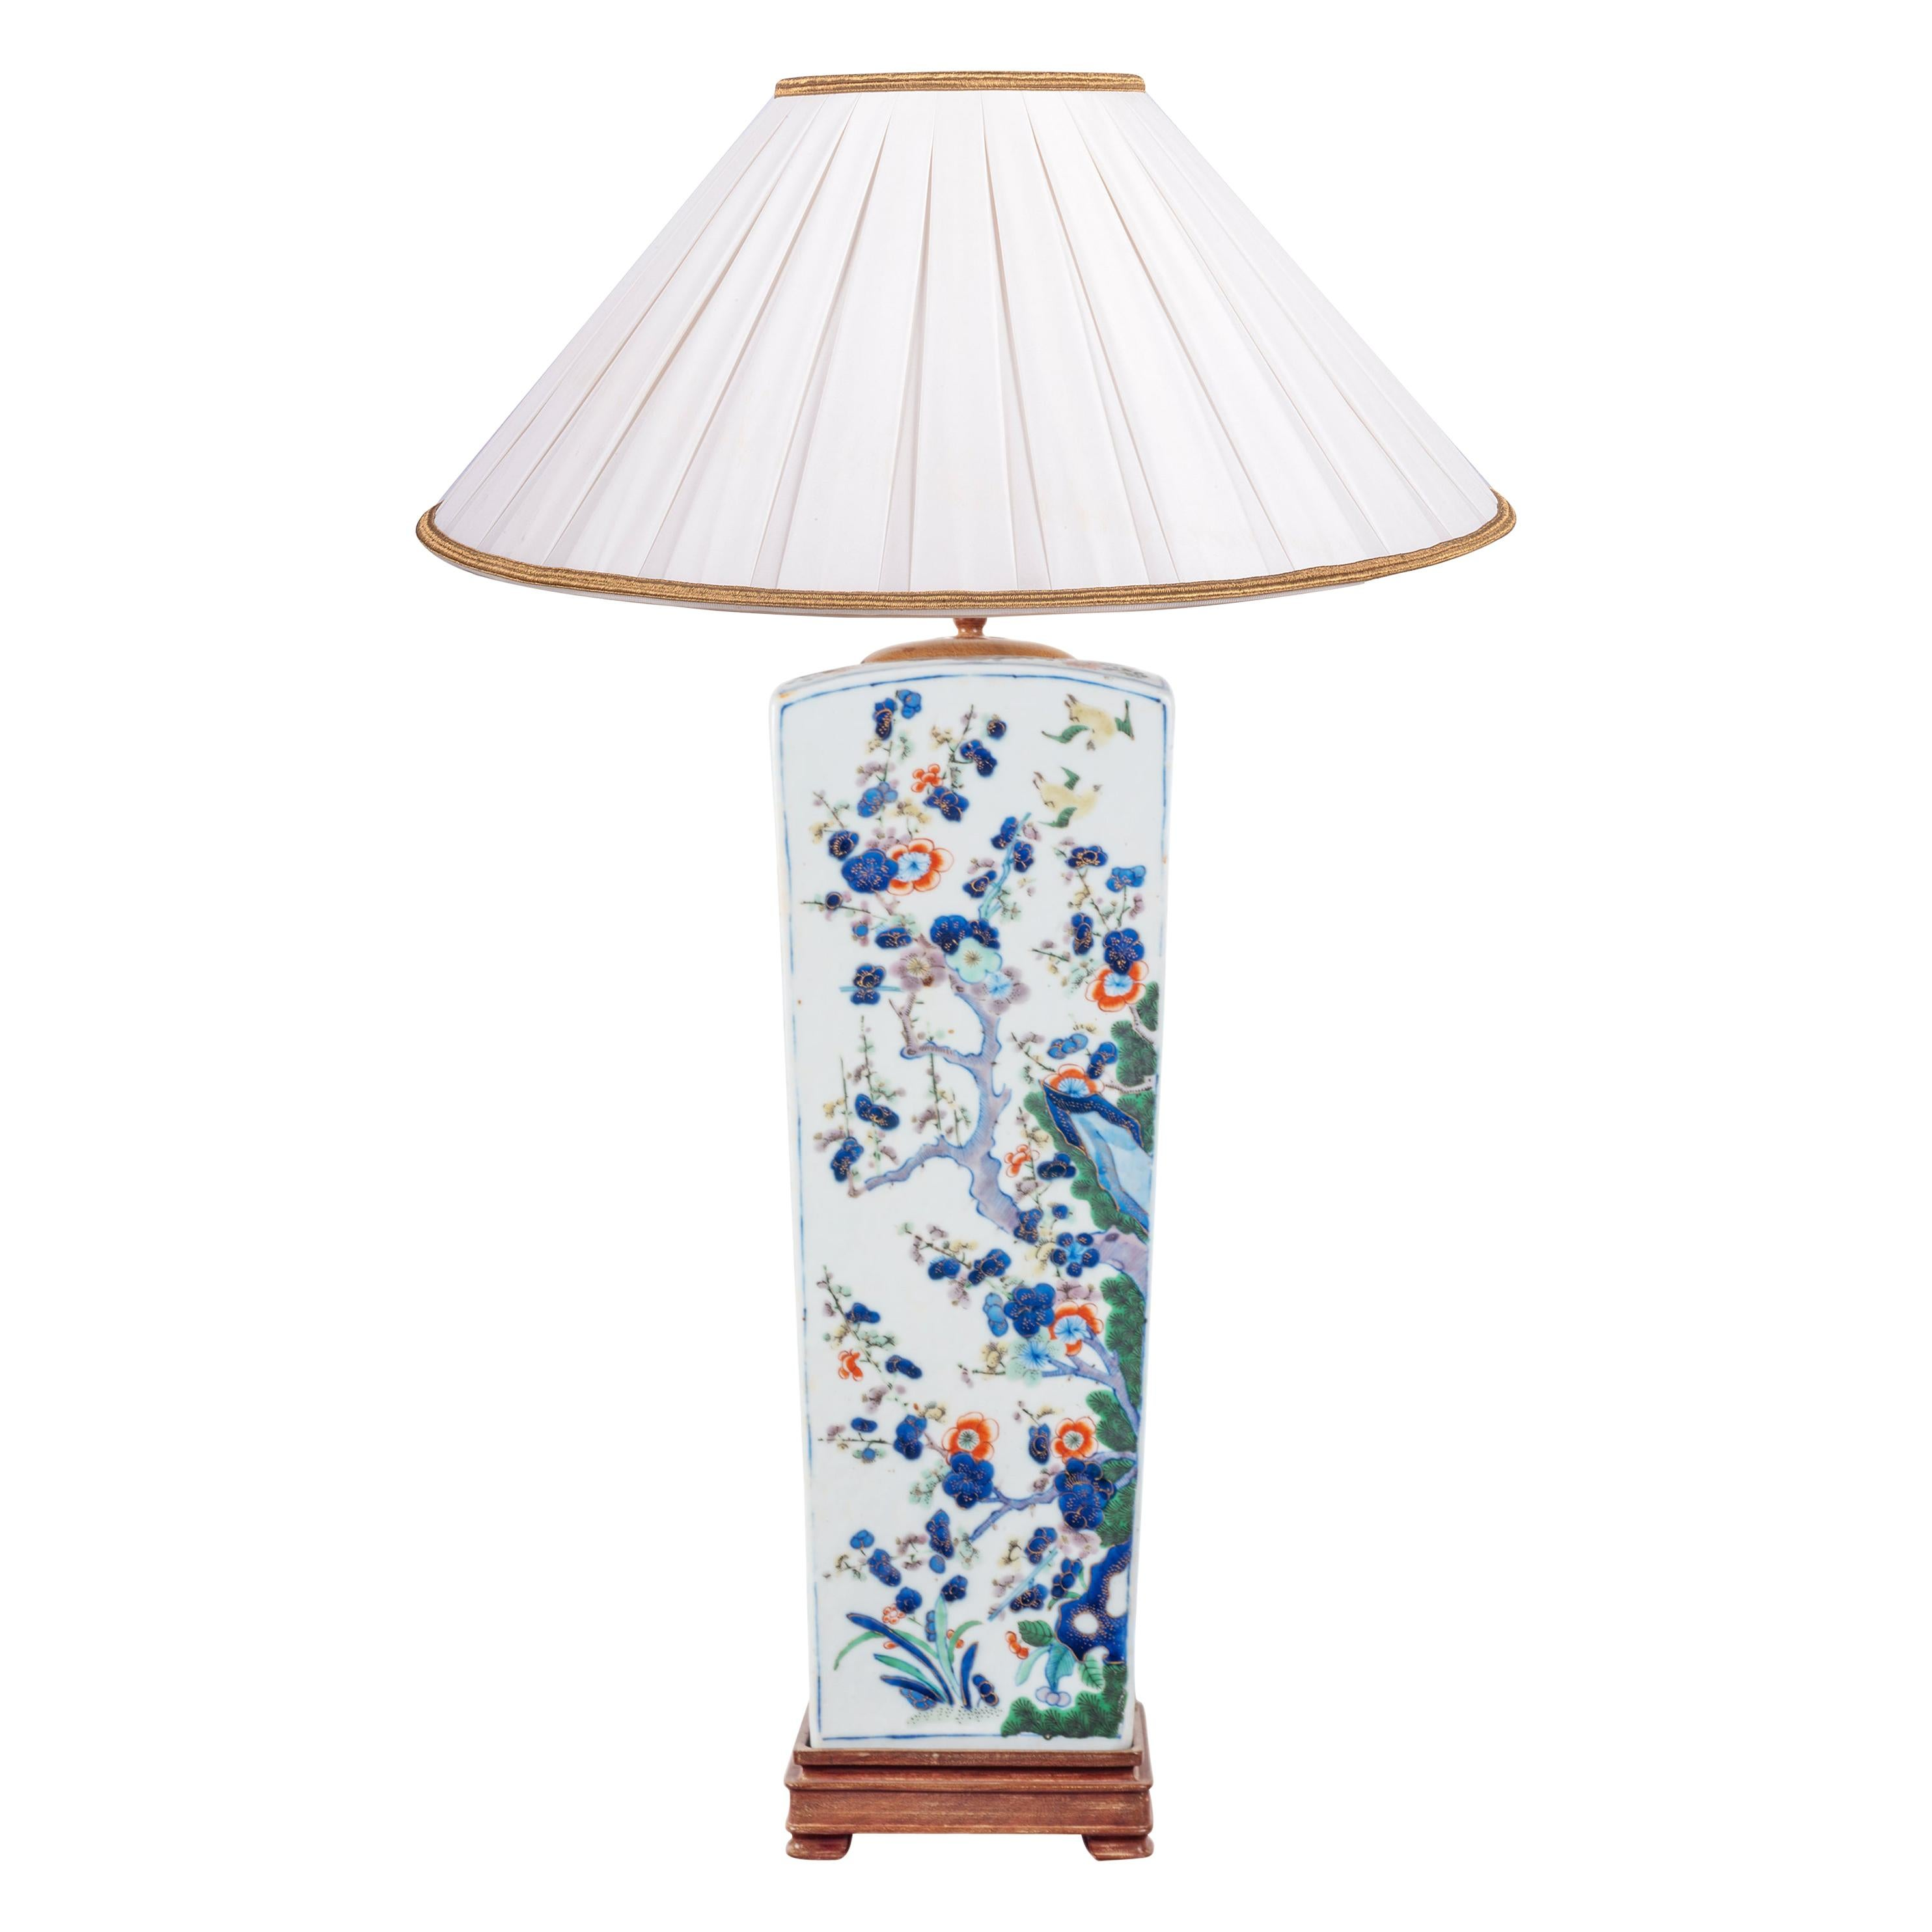 19th Century Chinese Famille Verte Vase or Lamp, circa 1880